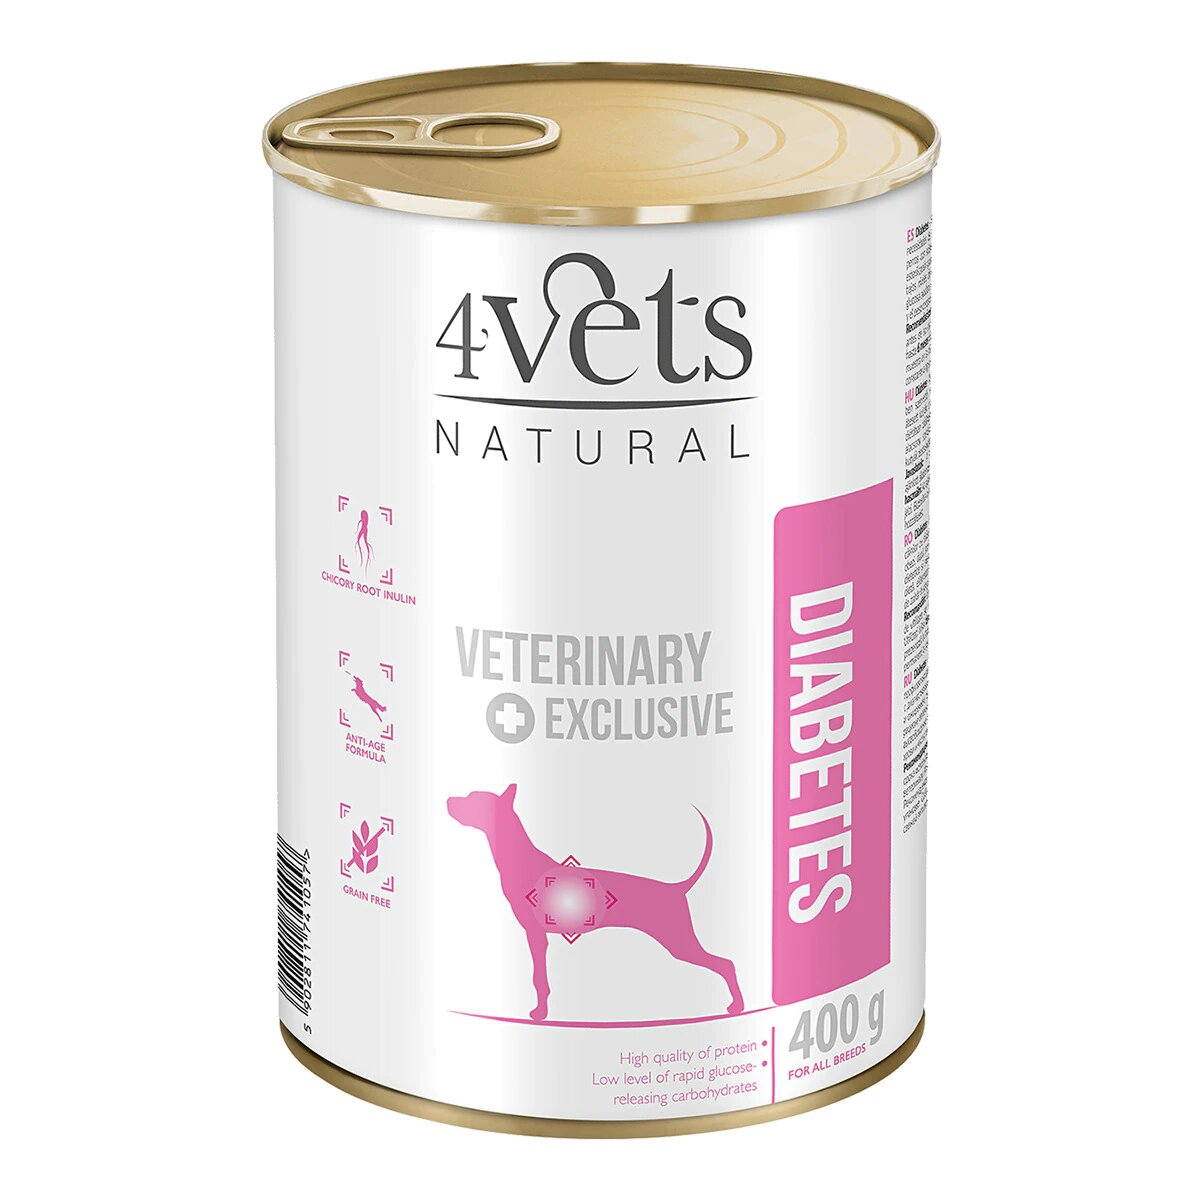 Comida para perros diabéticos 4vets natural